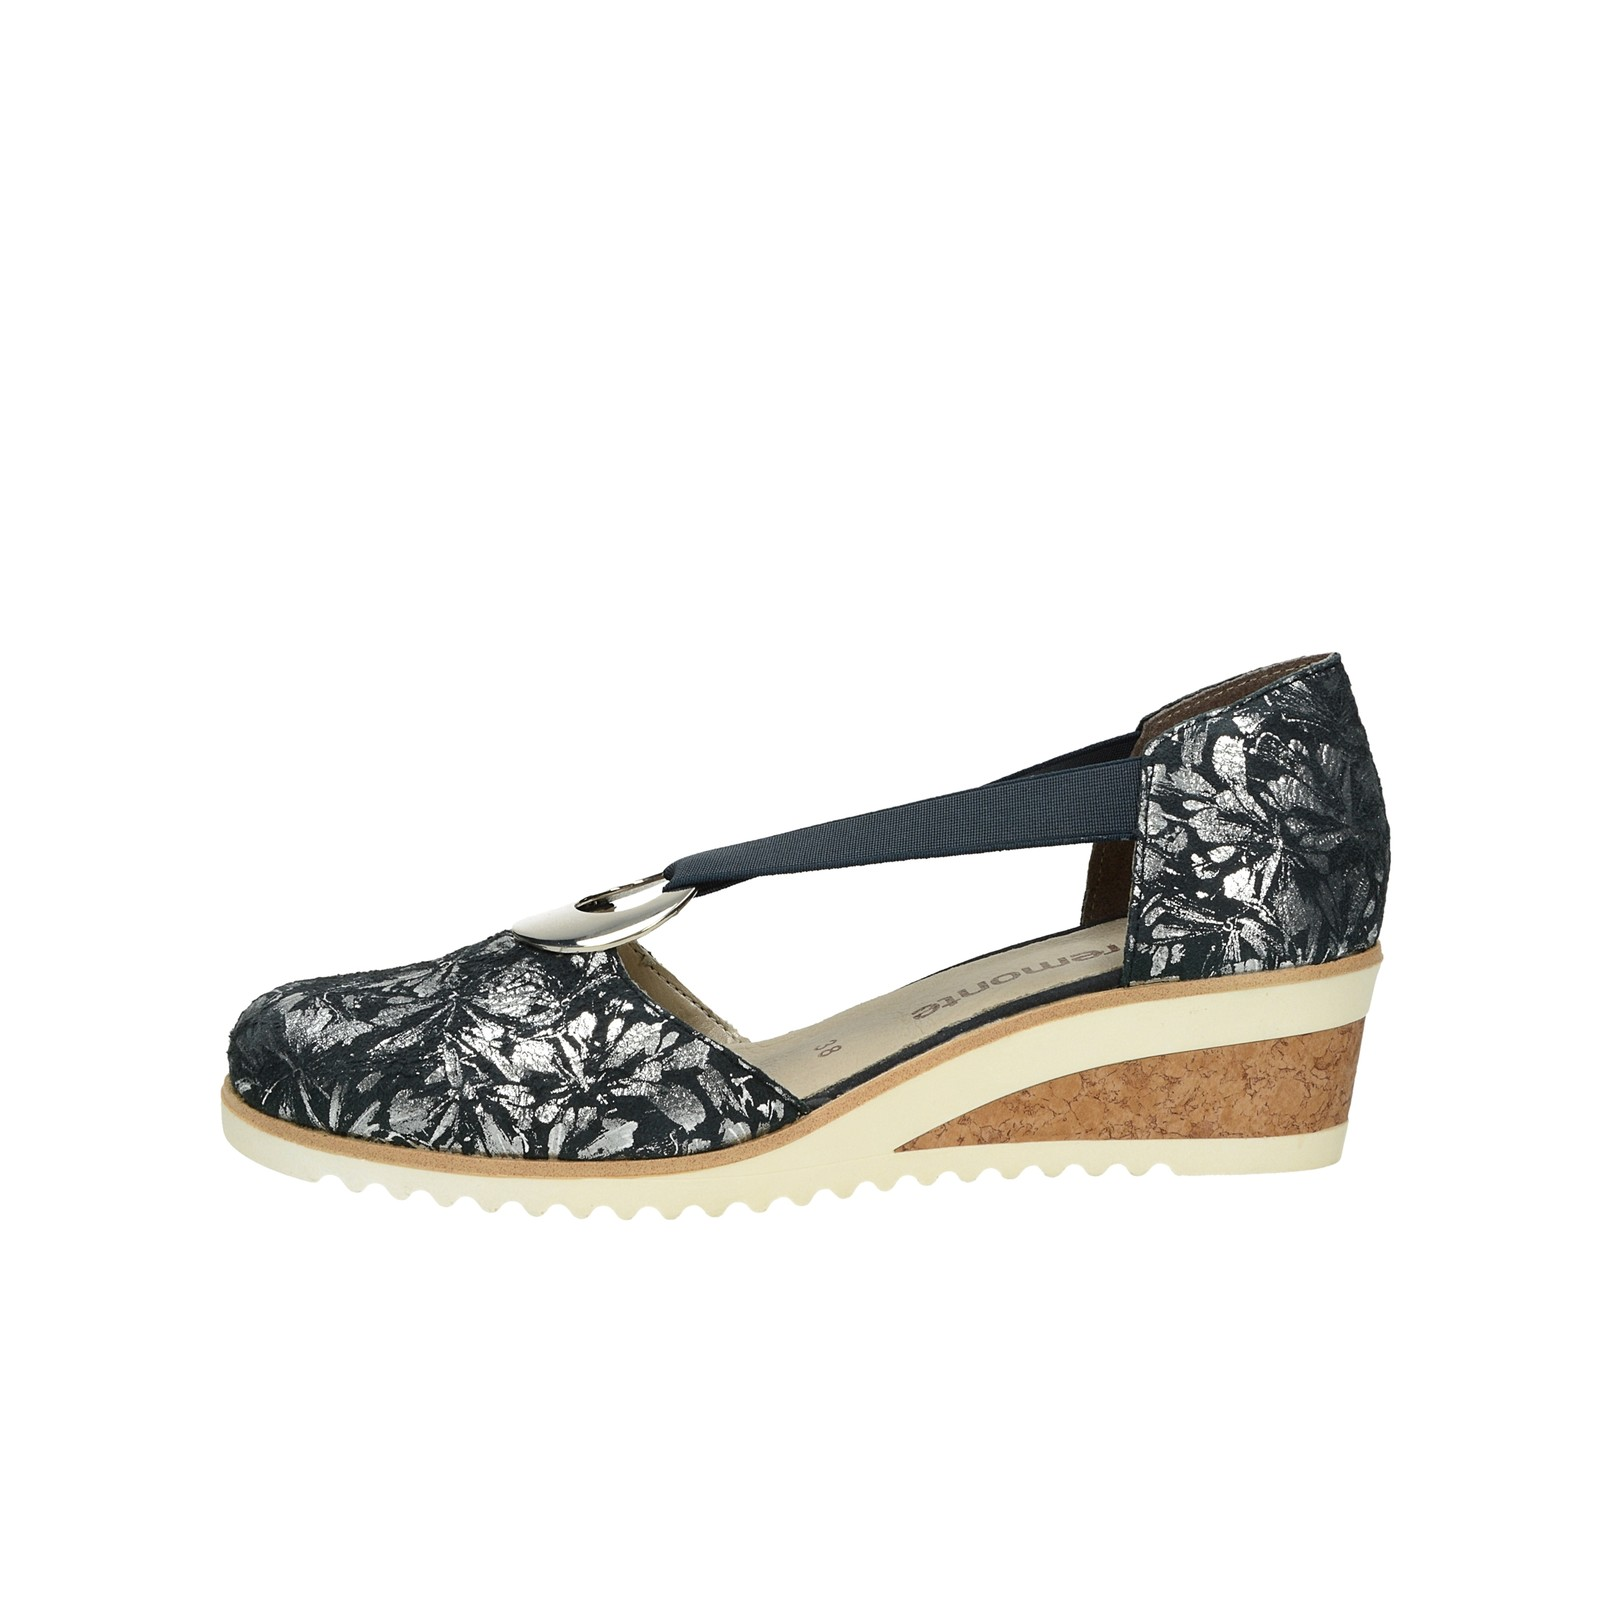 0d06f00b28ca ... Remonte dámske štýlové sandále s uzatvorenou pätou - tmavomodré ...